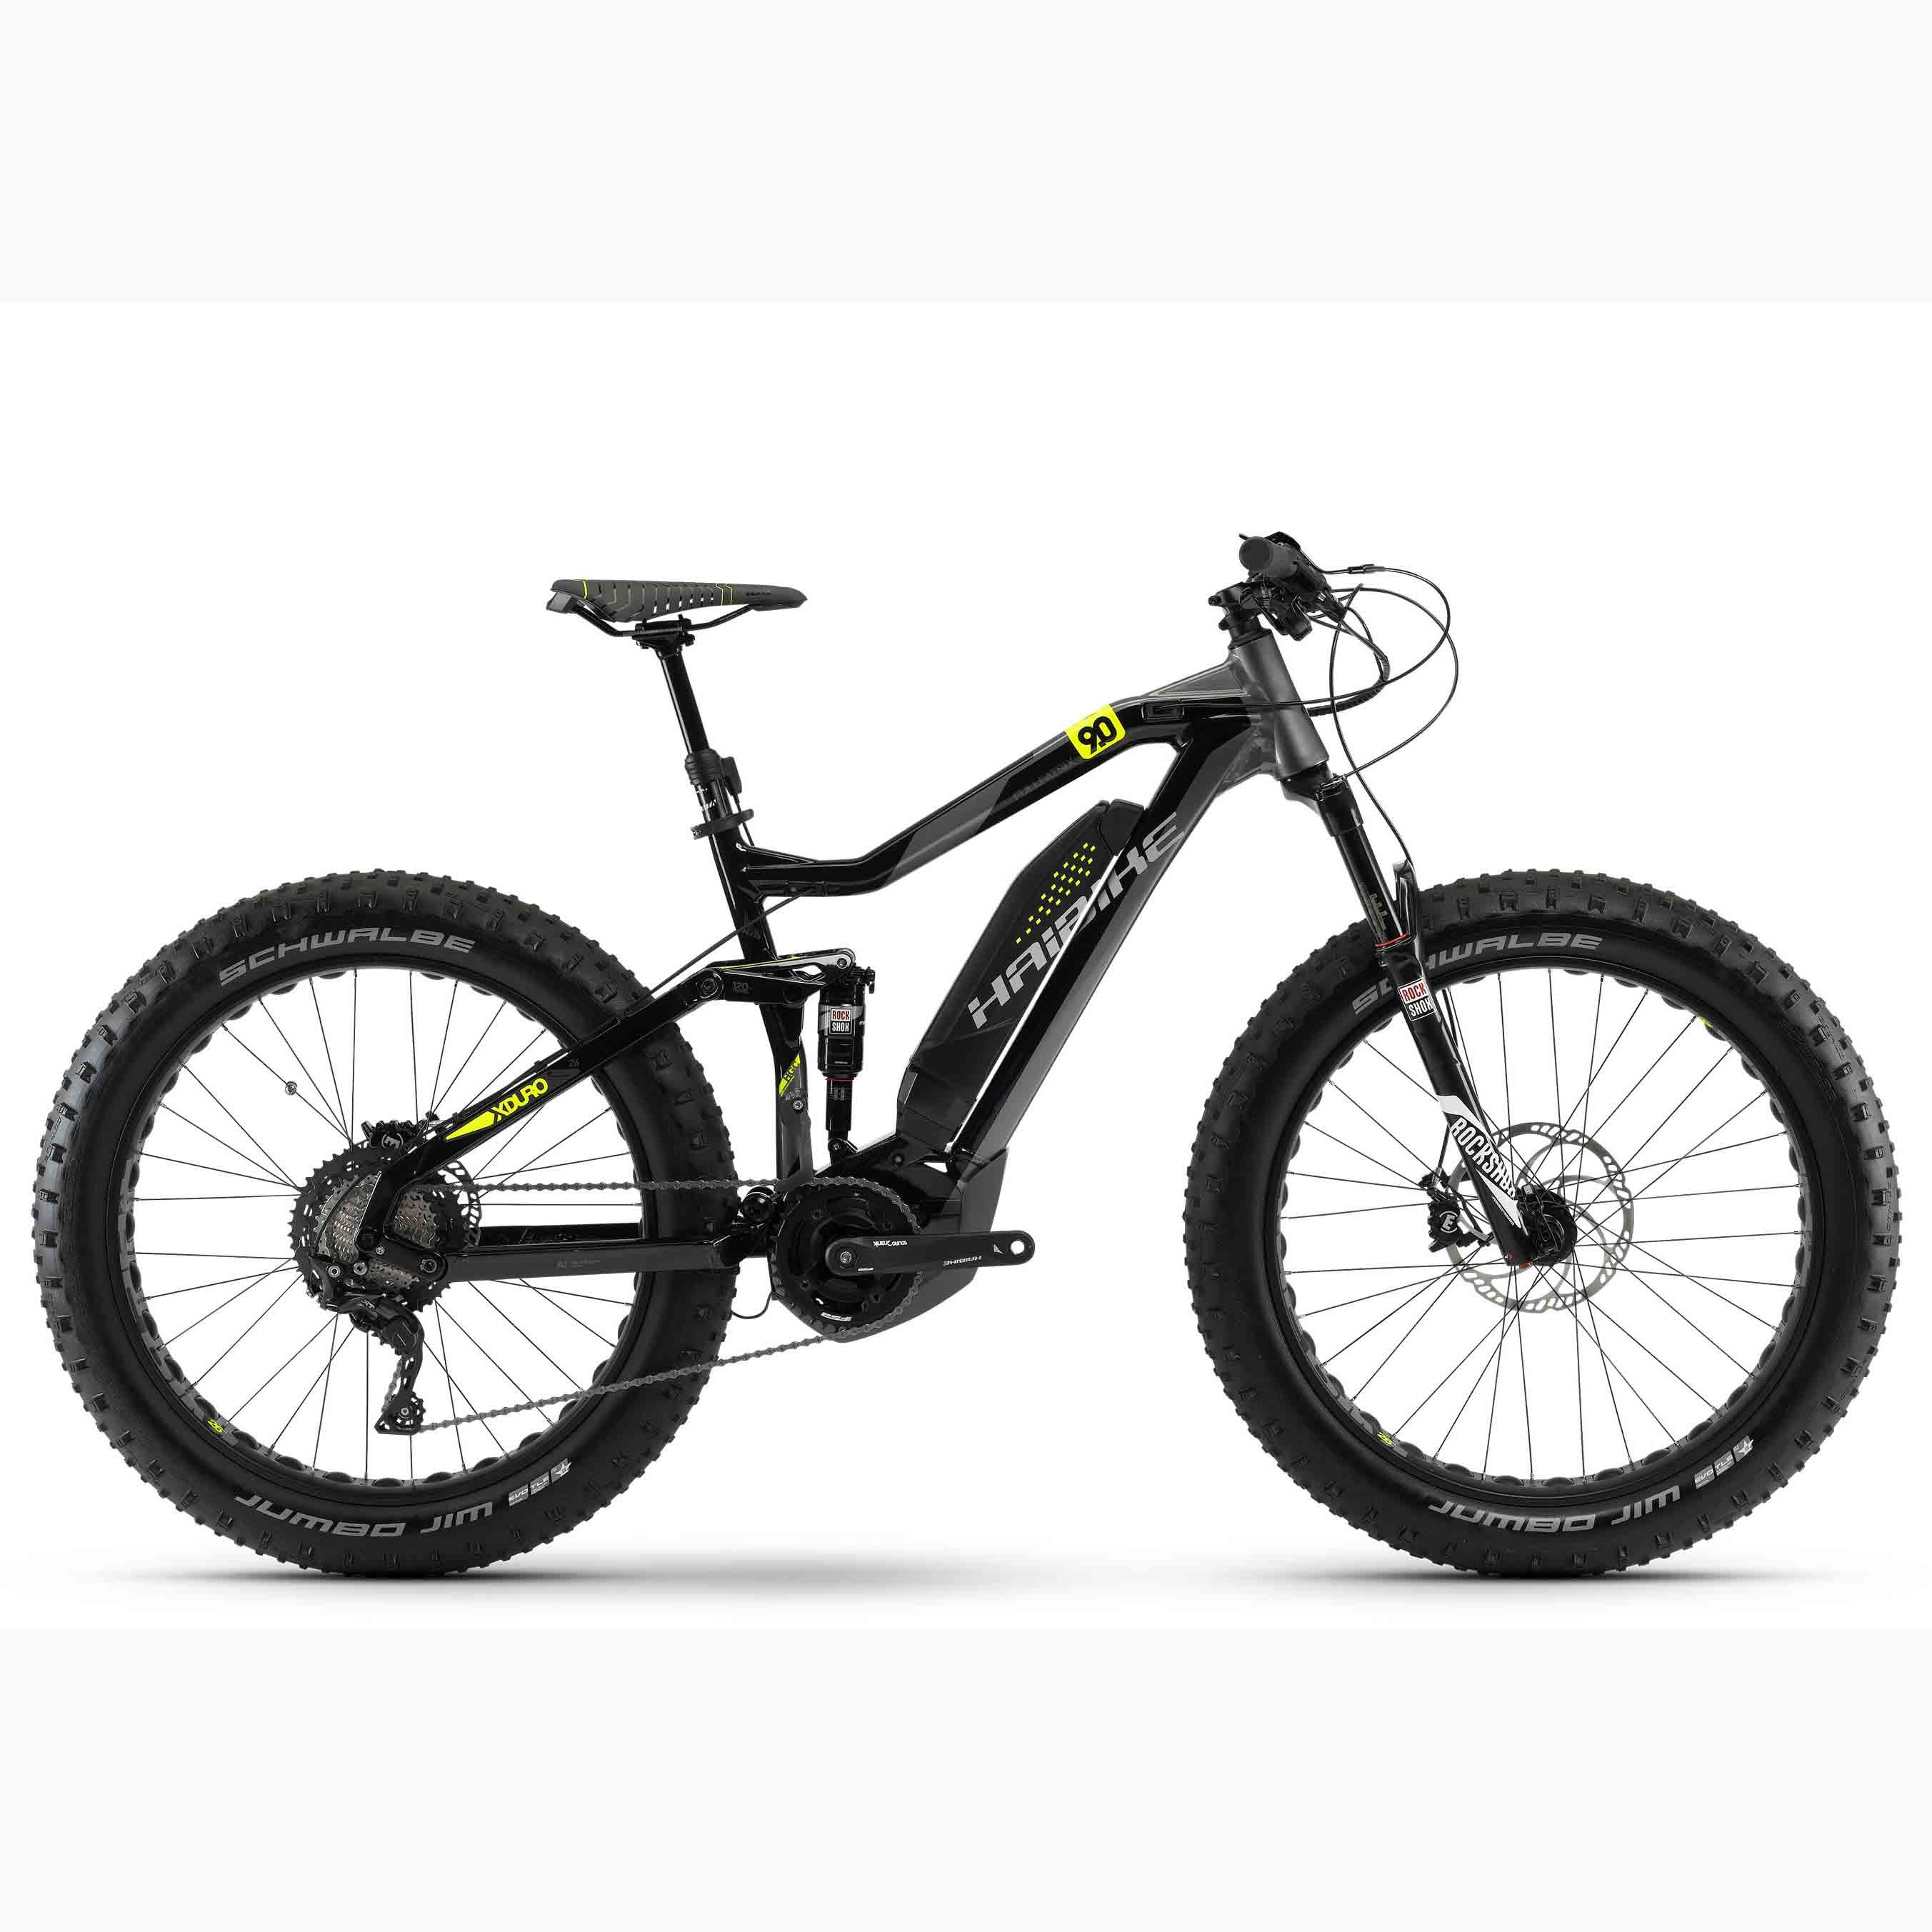 Фото Велосипед Haibike XDURO FullFatSix 9.0 26″ 500Wh, рама 50см, ход:120мм, 2018